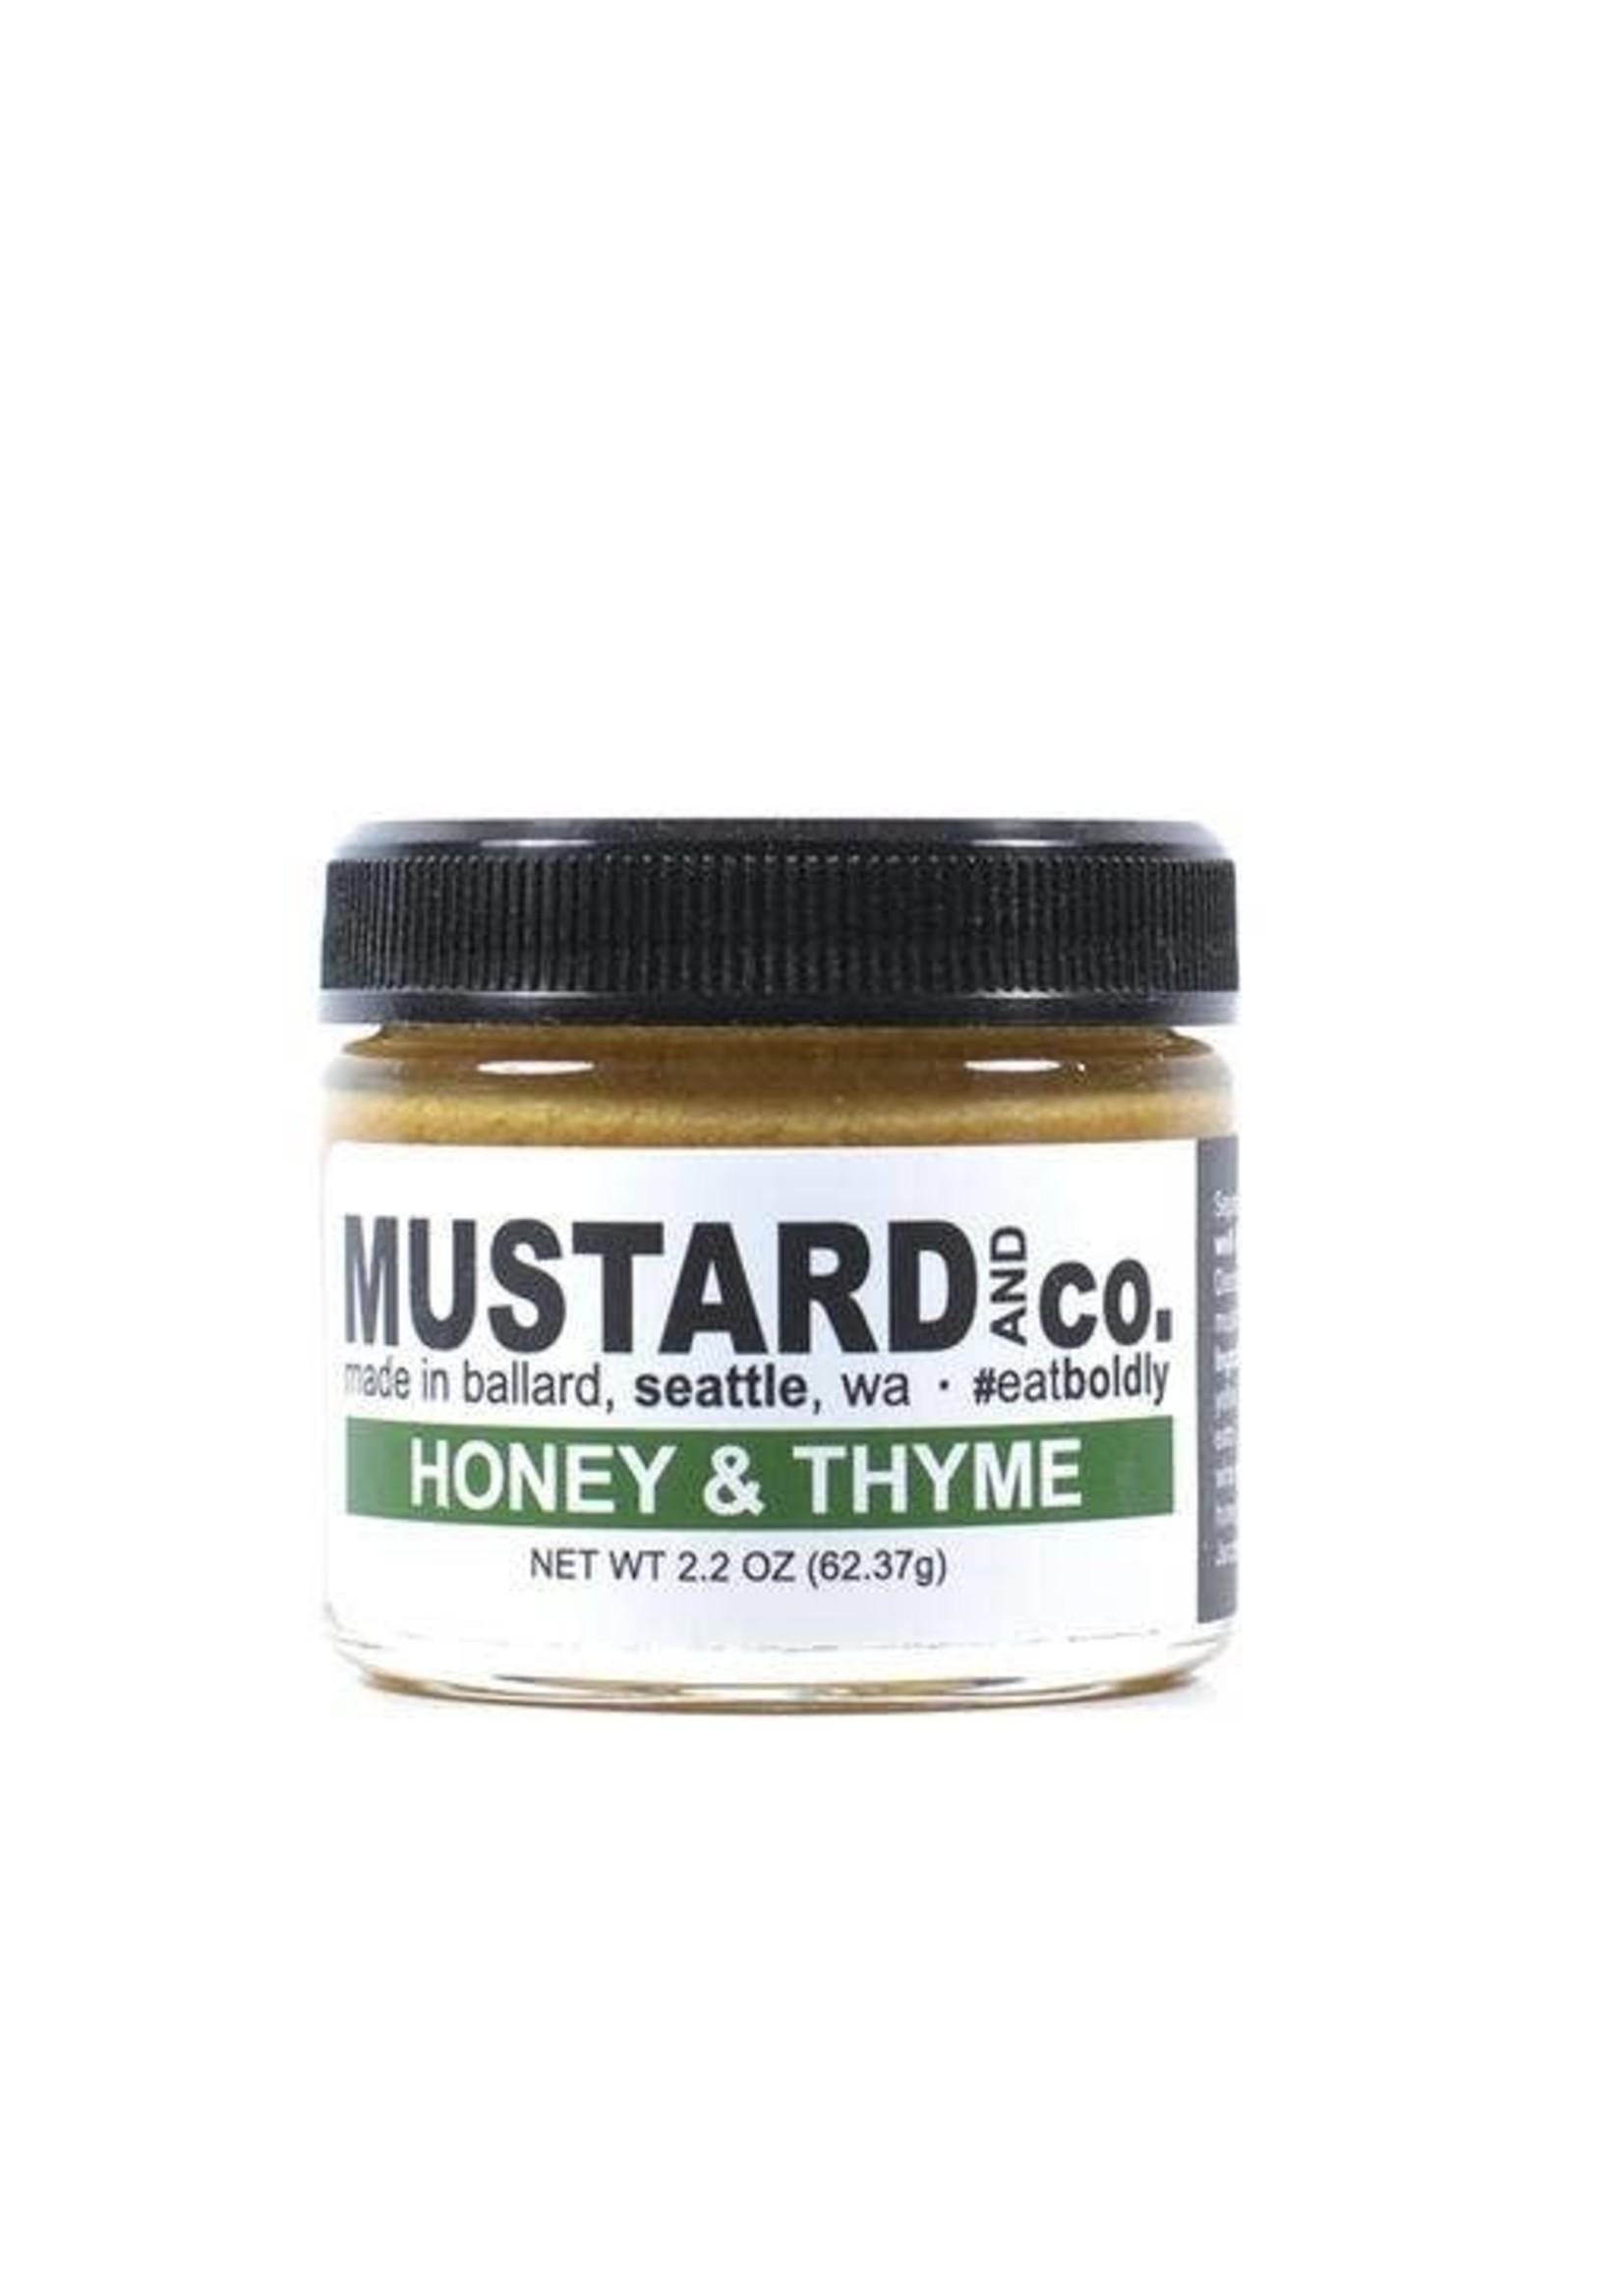 Honey & Thyme Mustard